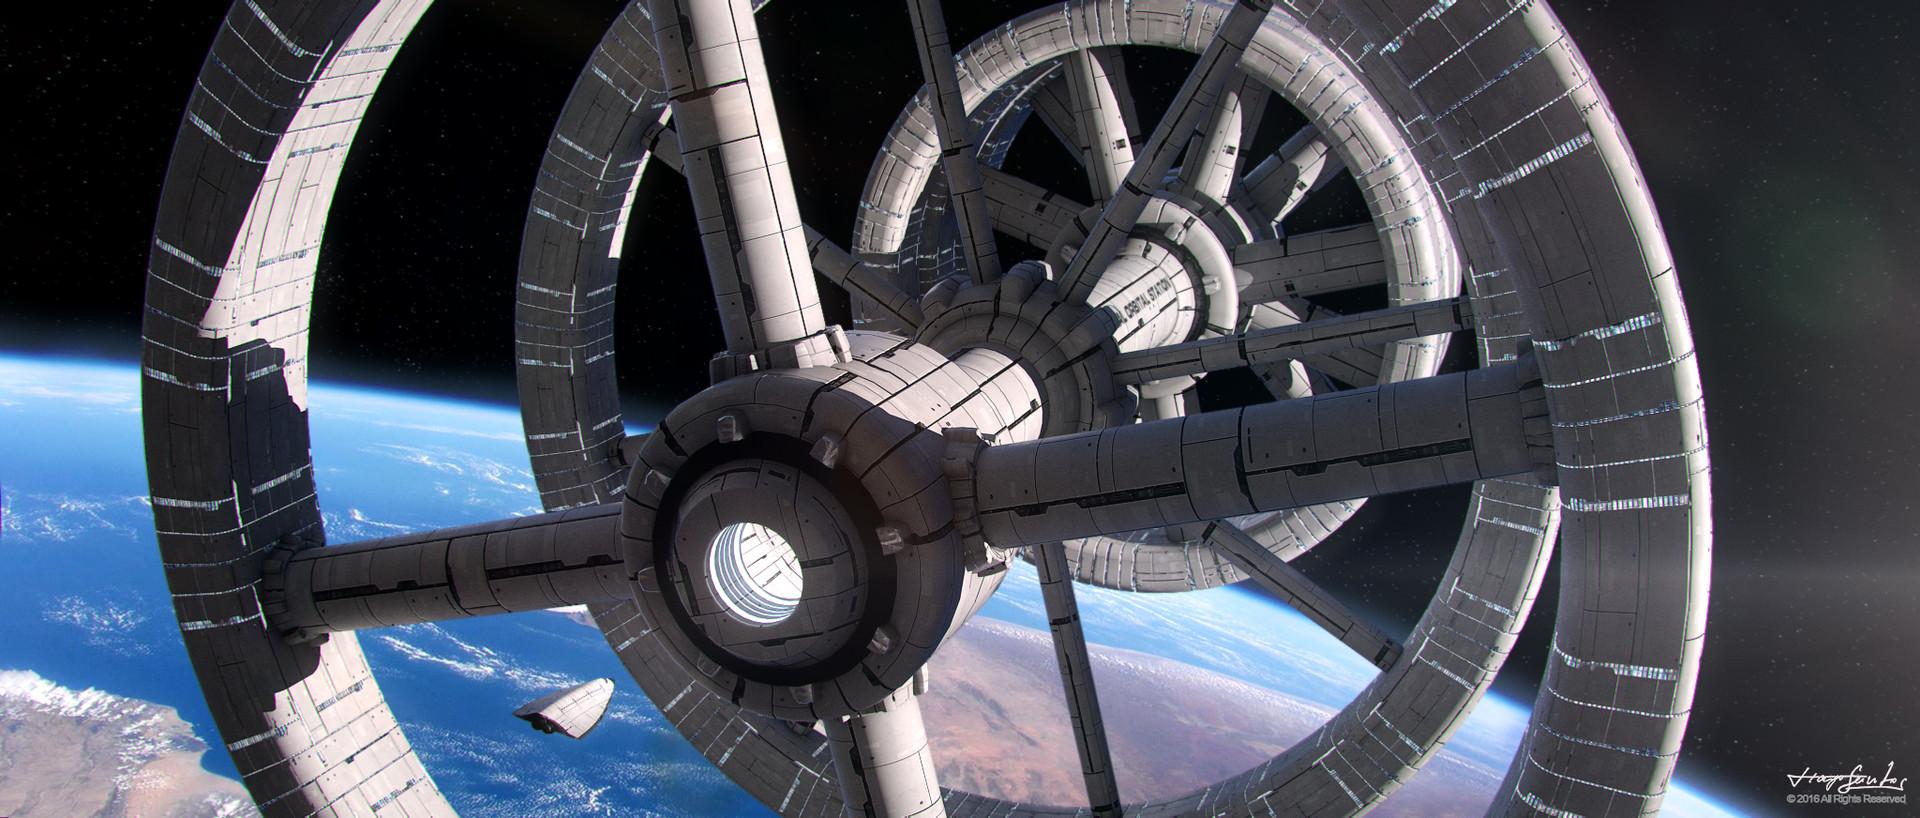 Tiago santos international orbital station